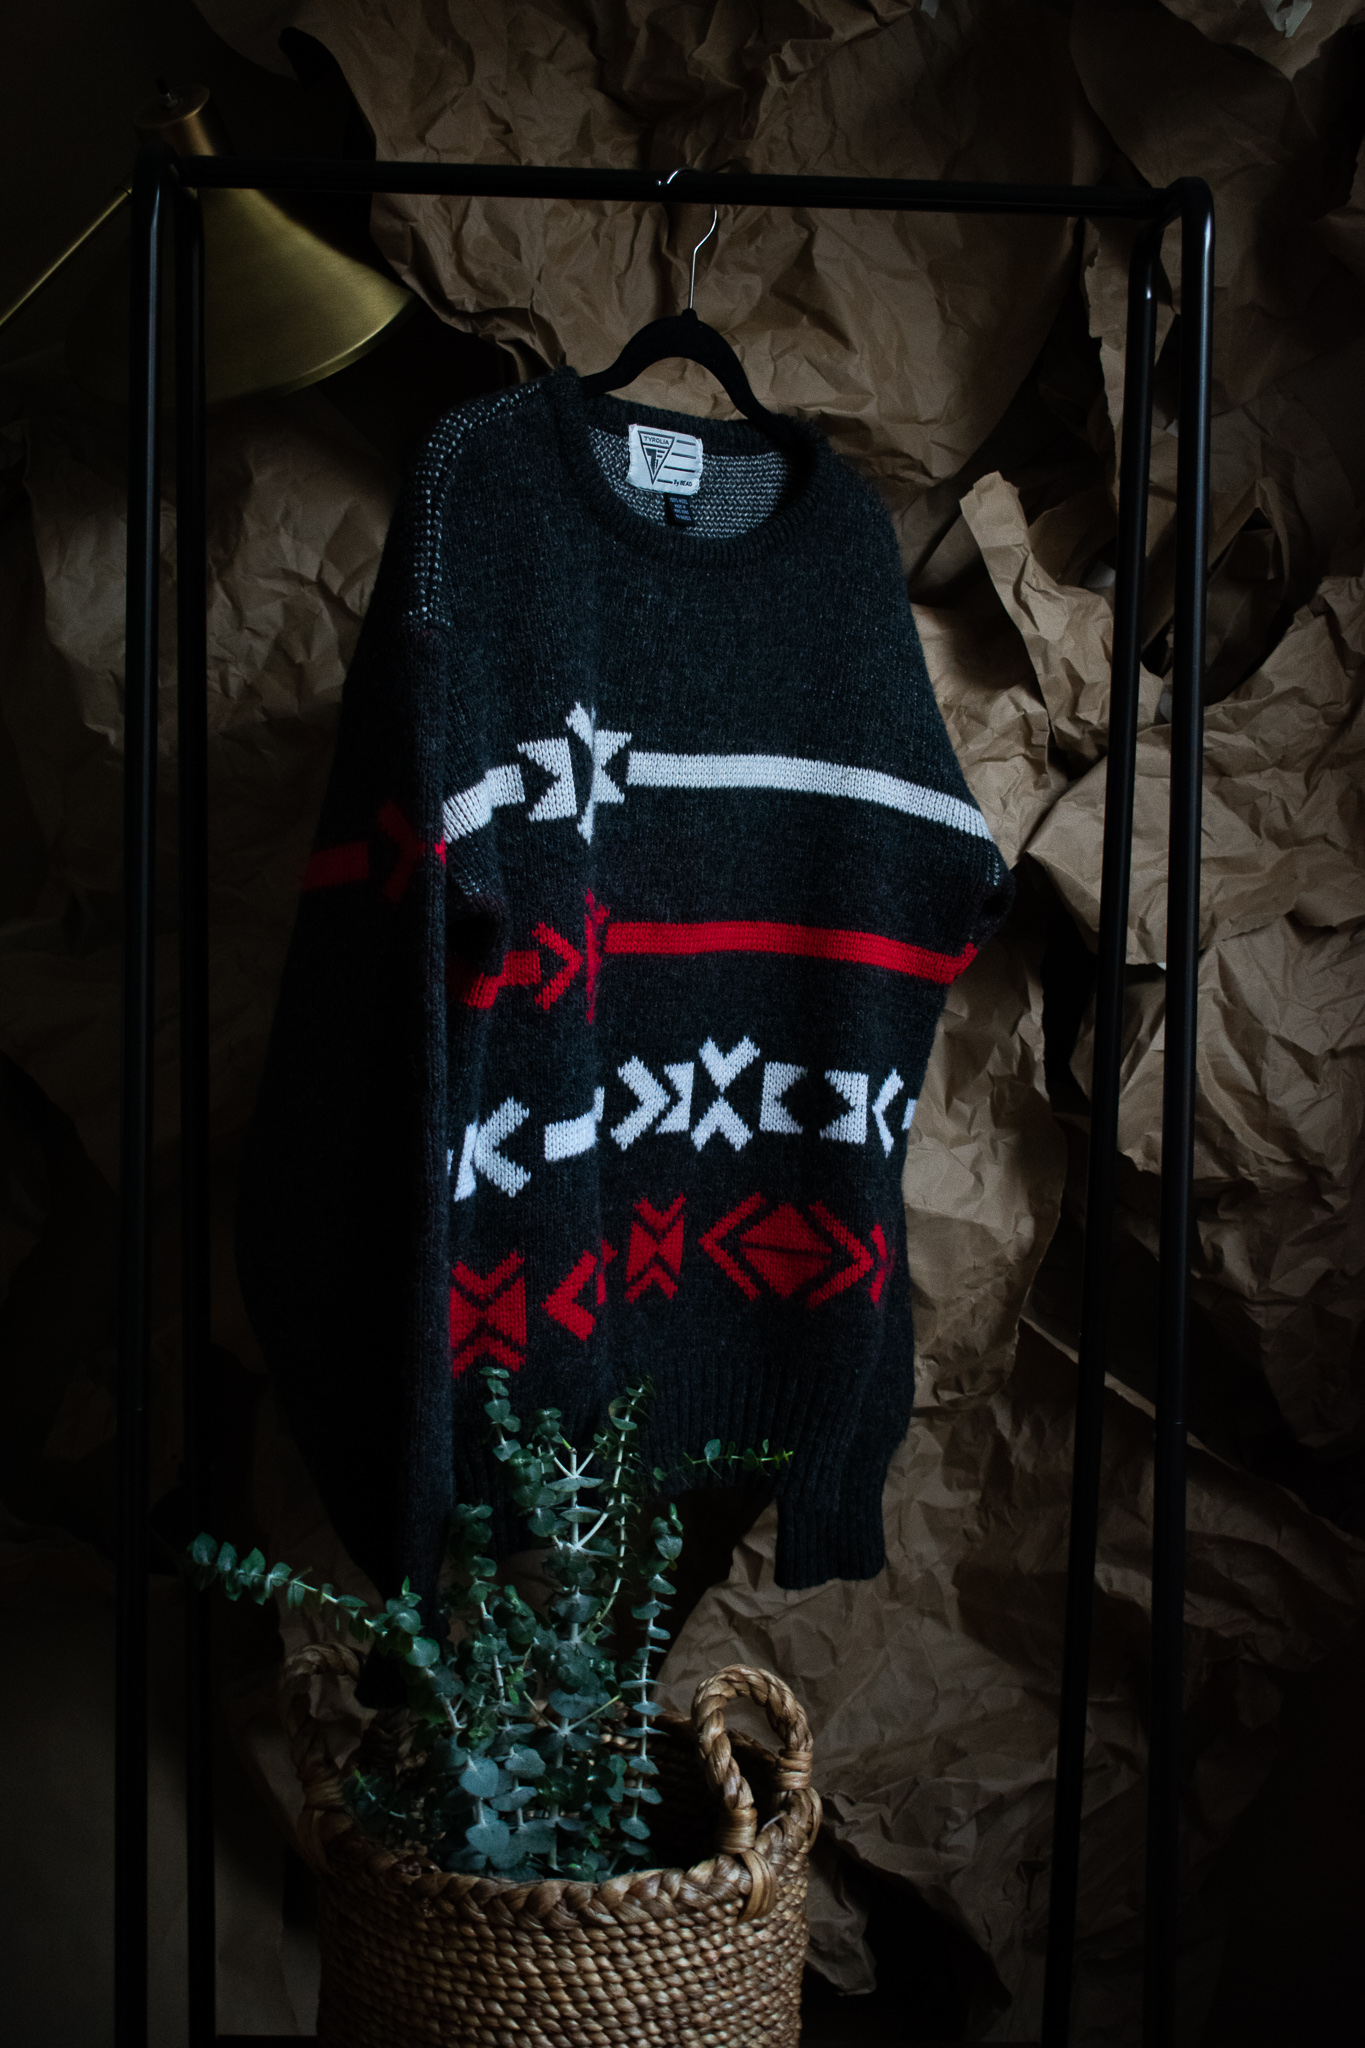 vintage wool sweater. 2 years. $5. good as new.